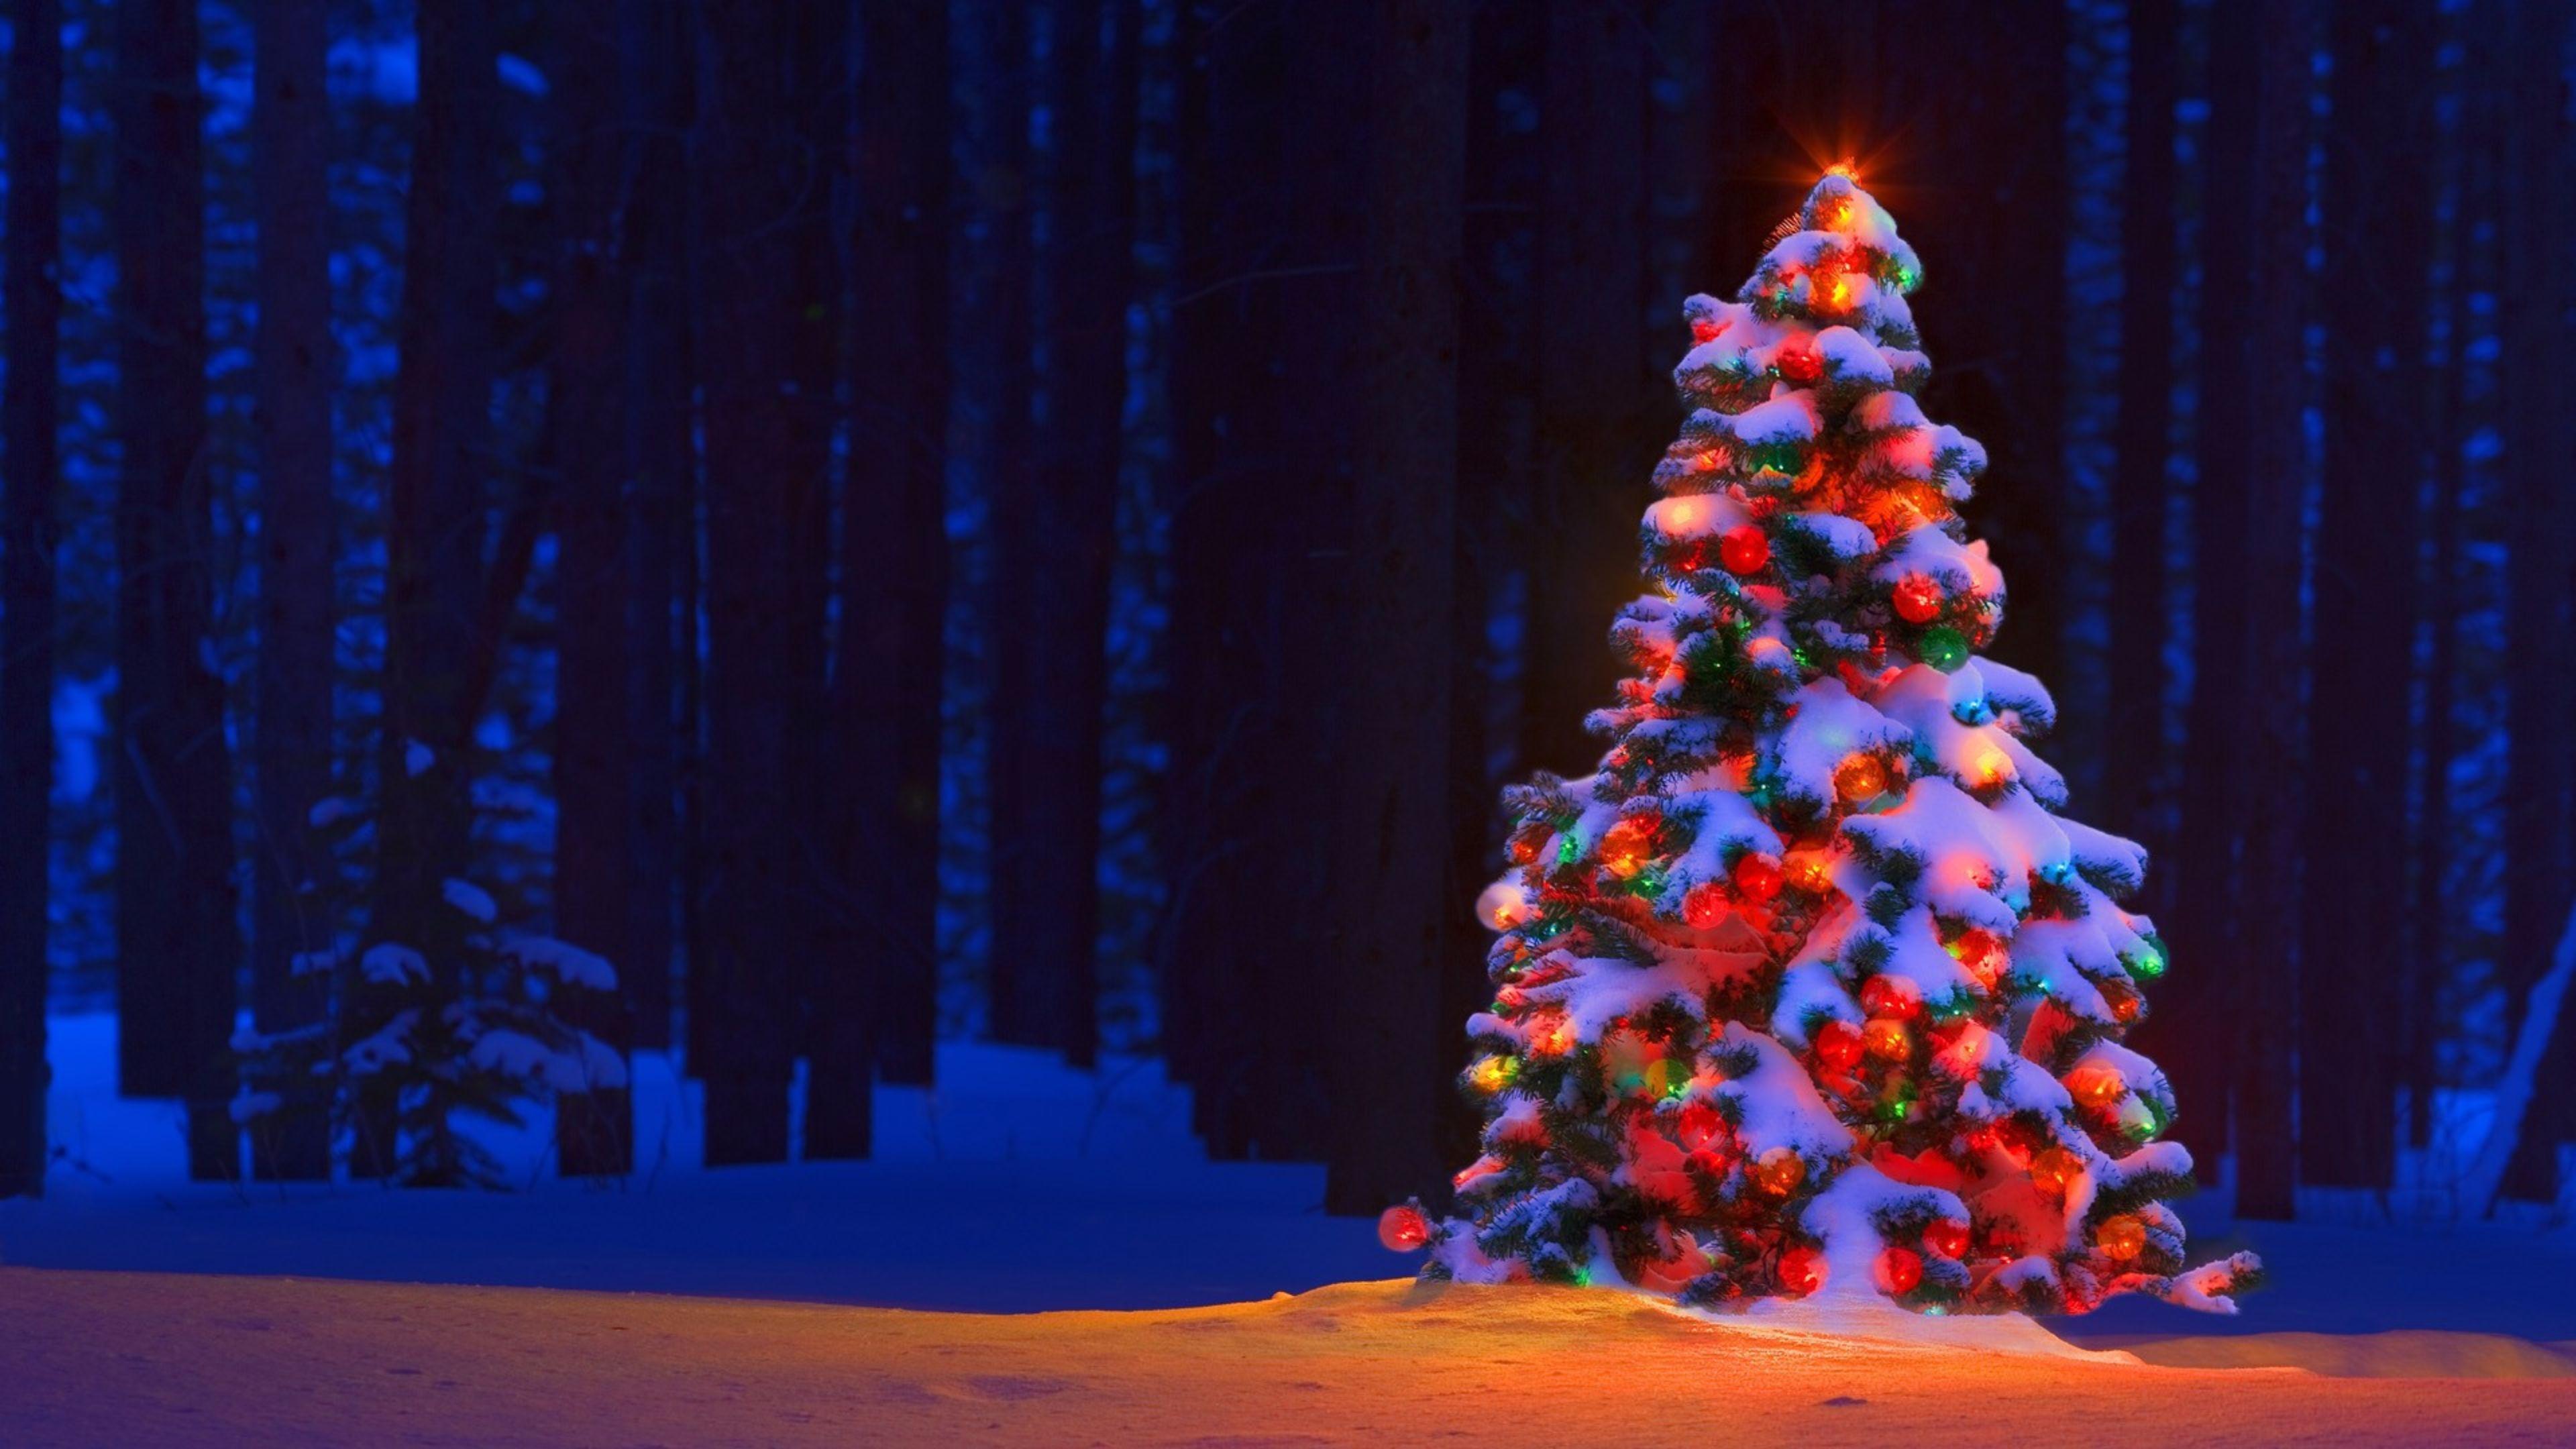 Christmas Wallpaper 4k.4k Christmas Wallpapers Top Free 4k Christmas Backgrounds